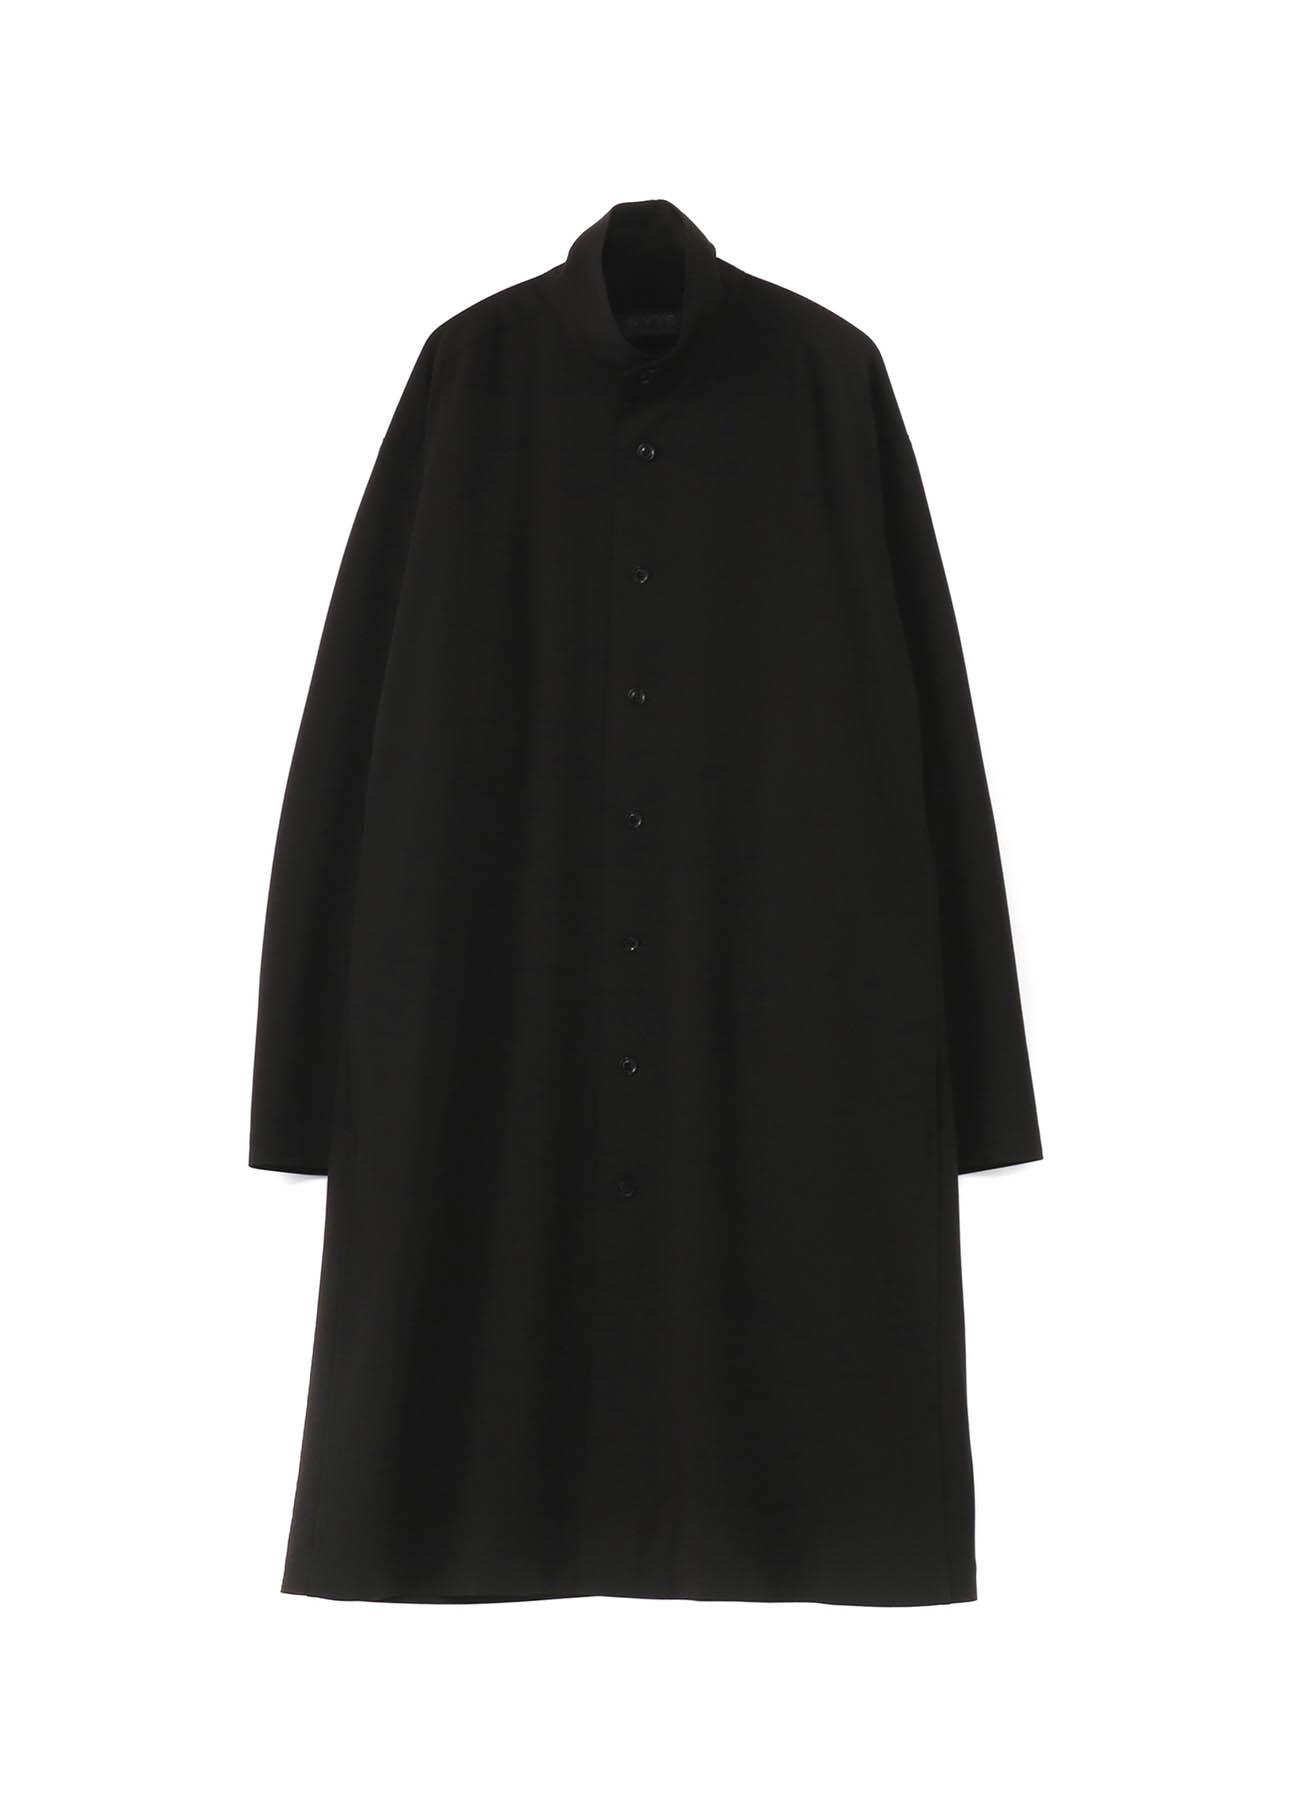 Pe/Rayon Gabardine Stretc Stand Collar Shirt Coat